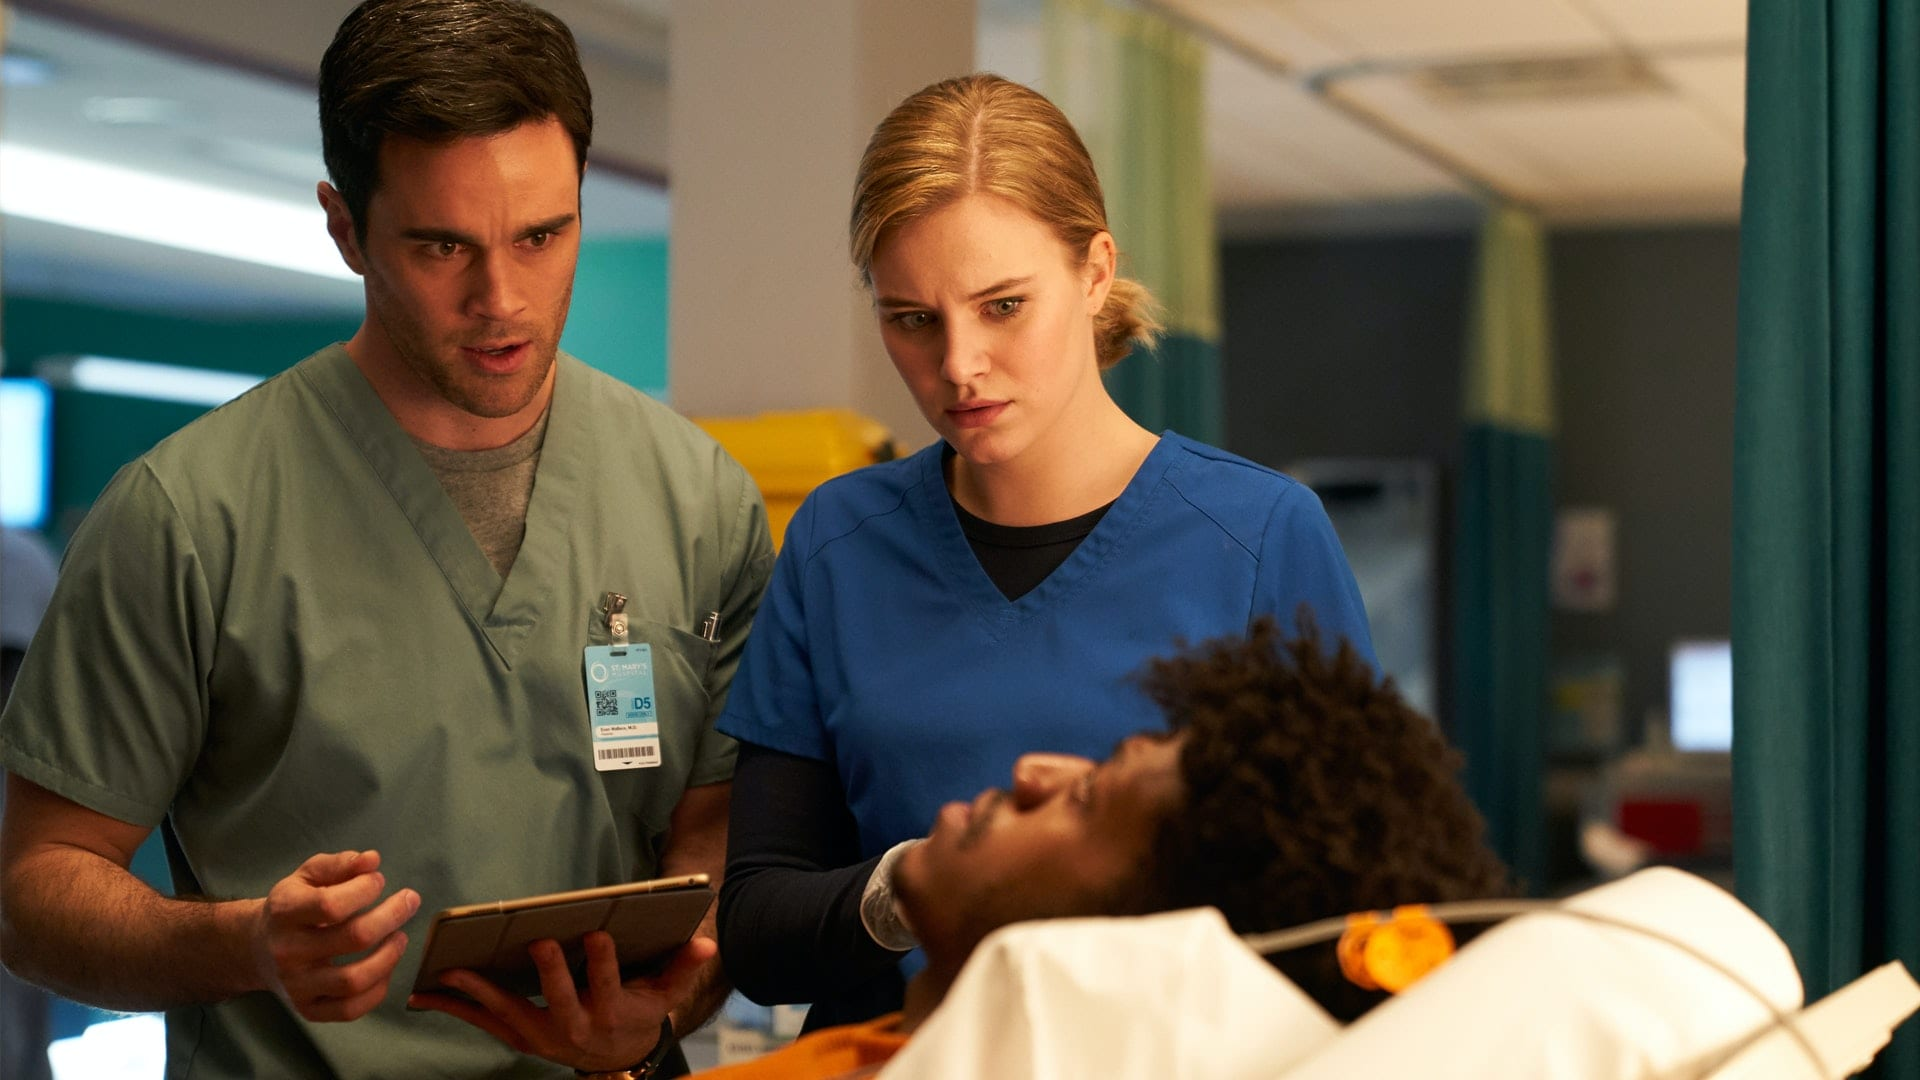 Preview and Spoilers: Nurses Season 2 Episode 2